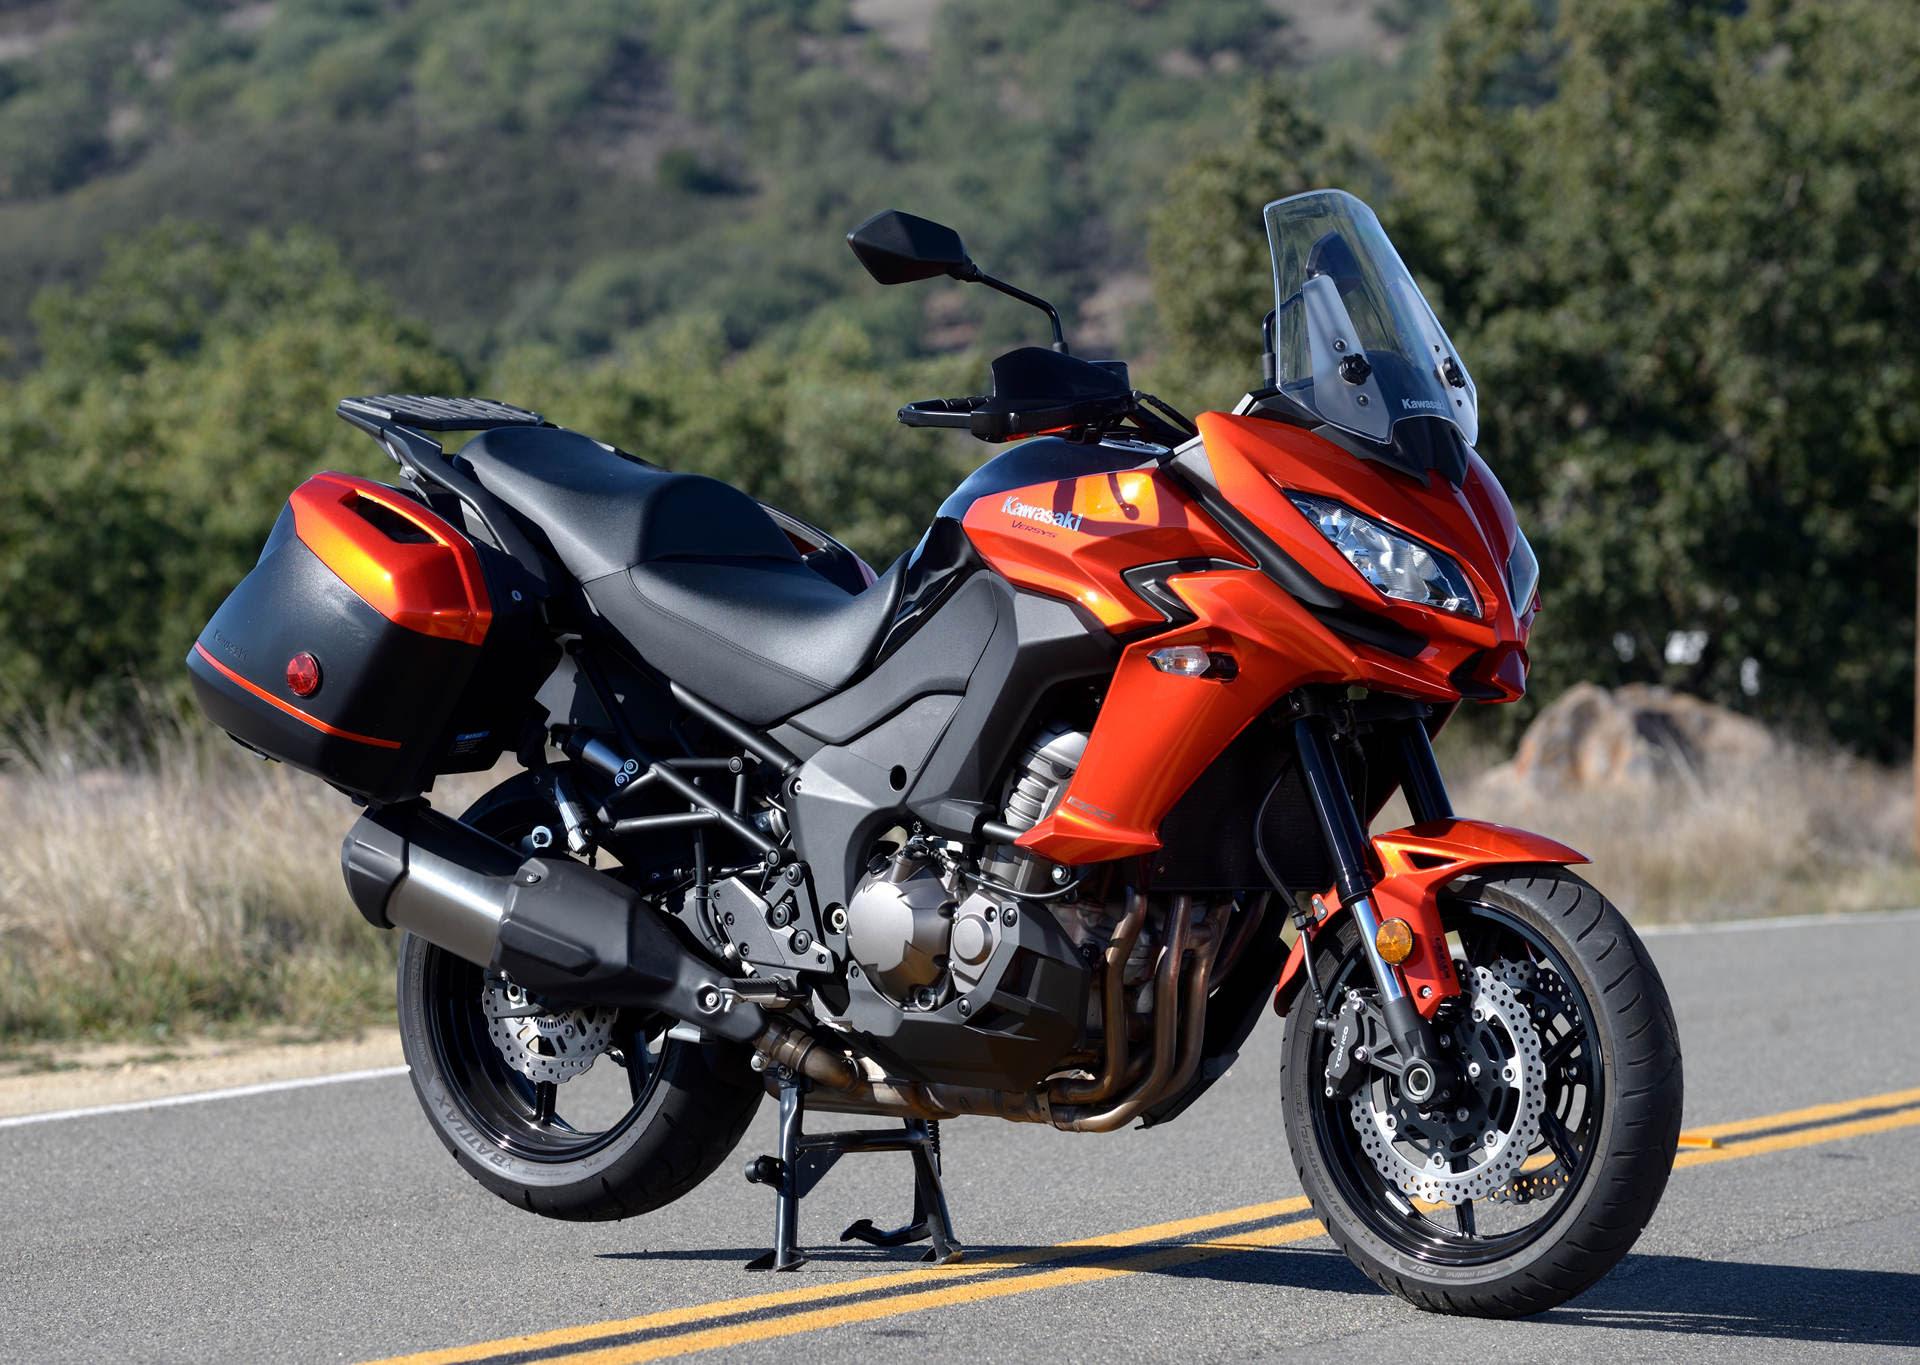 Md 2015 Bike Of The Year The Kawasaki Versys 1000 Lt